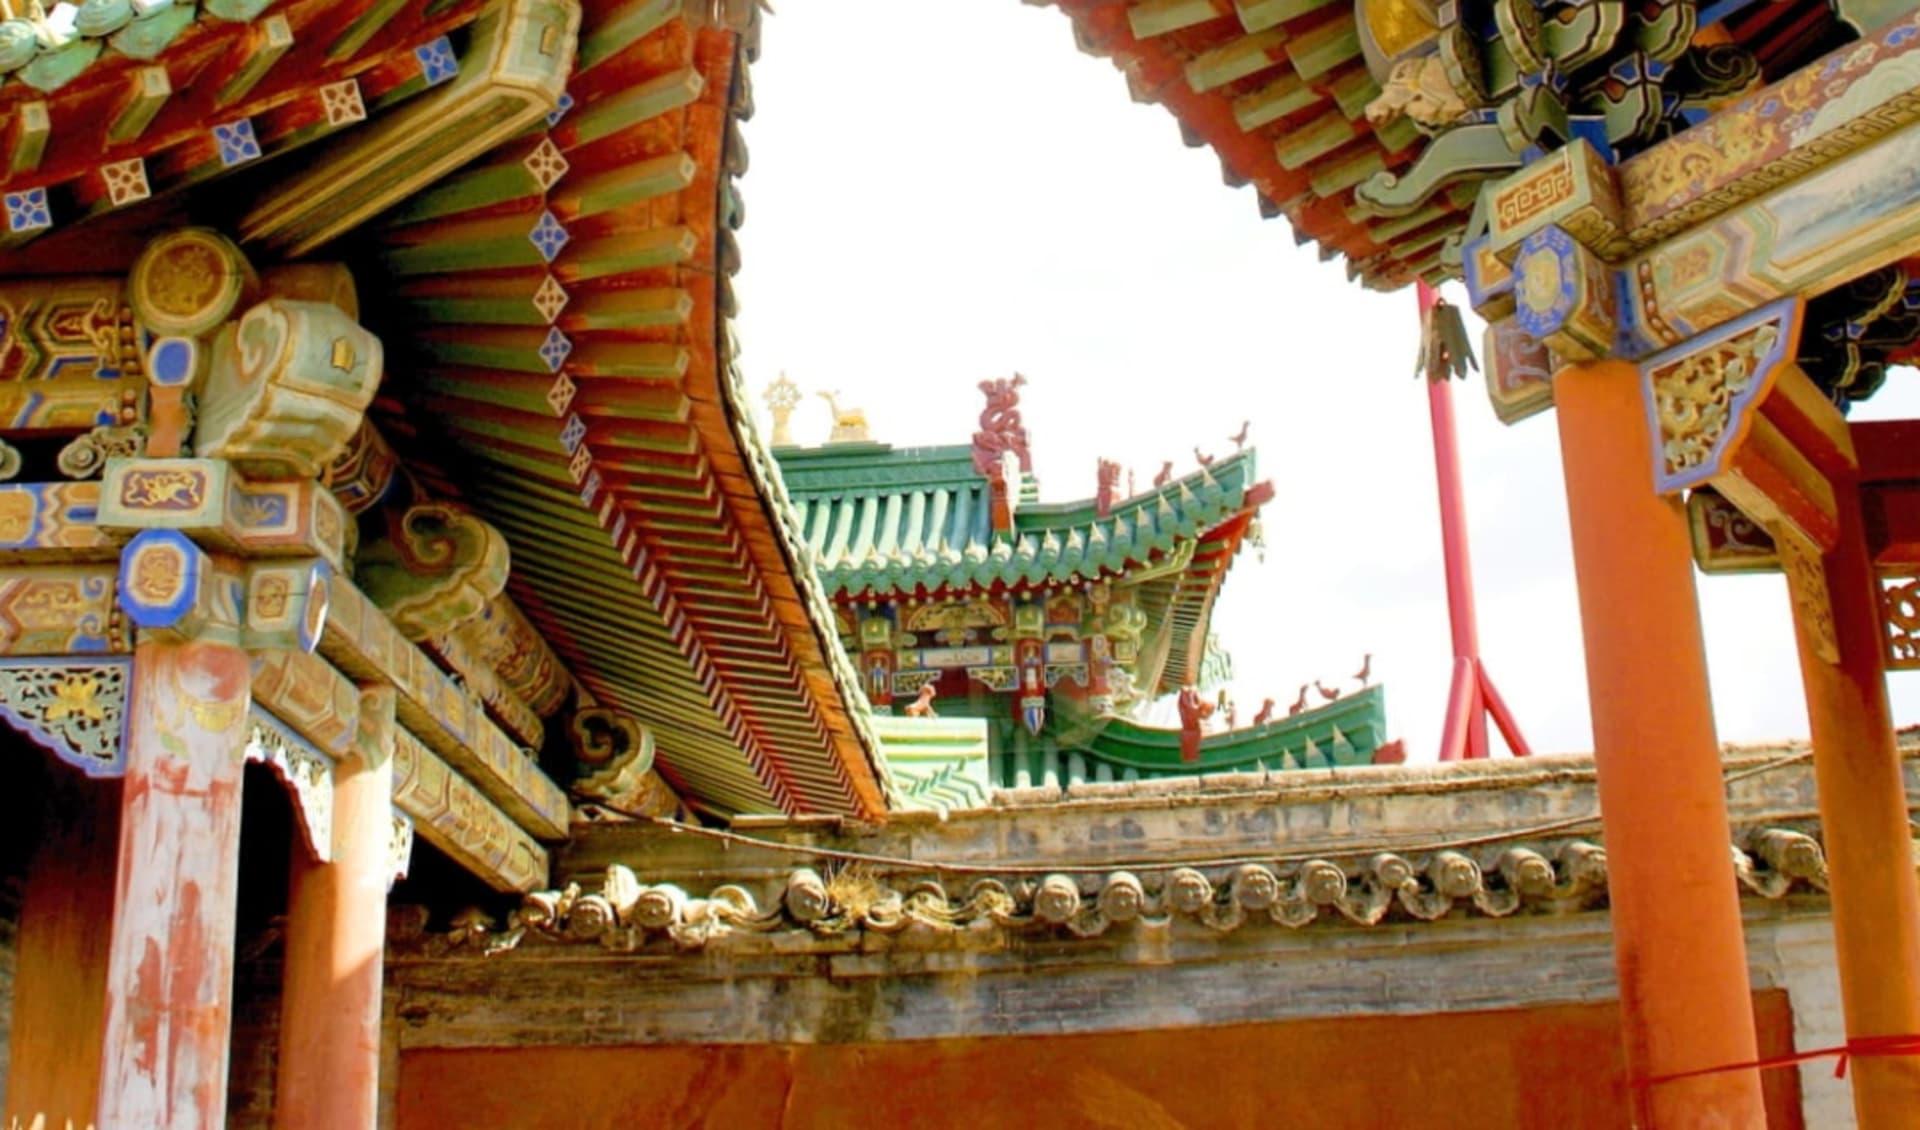 Hauptstadt des Dschingis Khan ab Ulaanbaatar: Mongolei_UlanBator_Winterpalast_